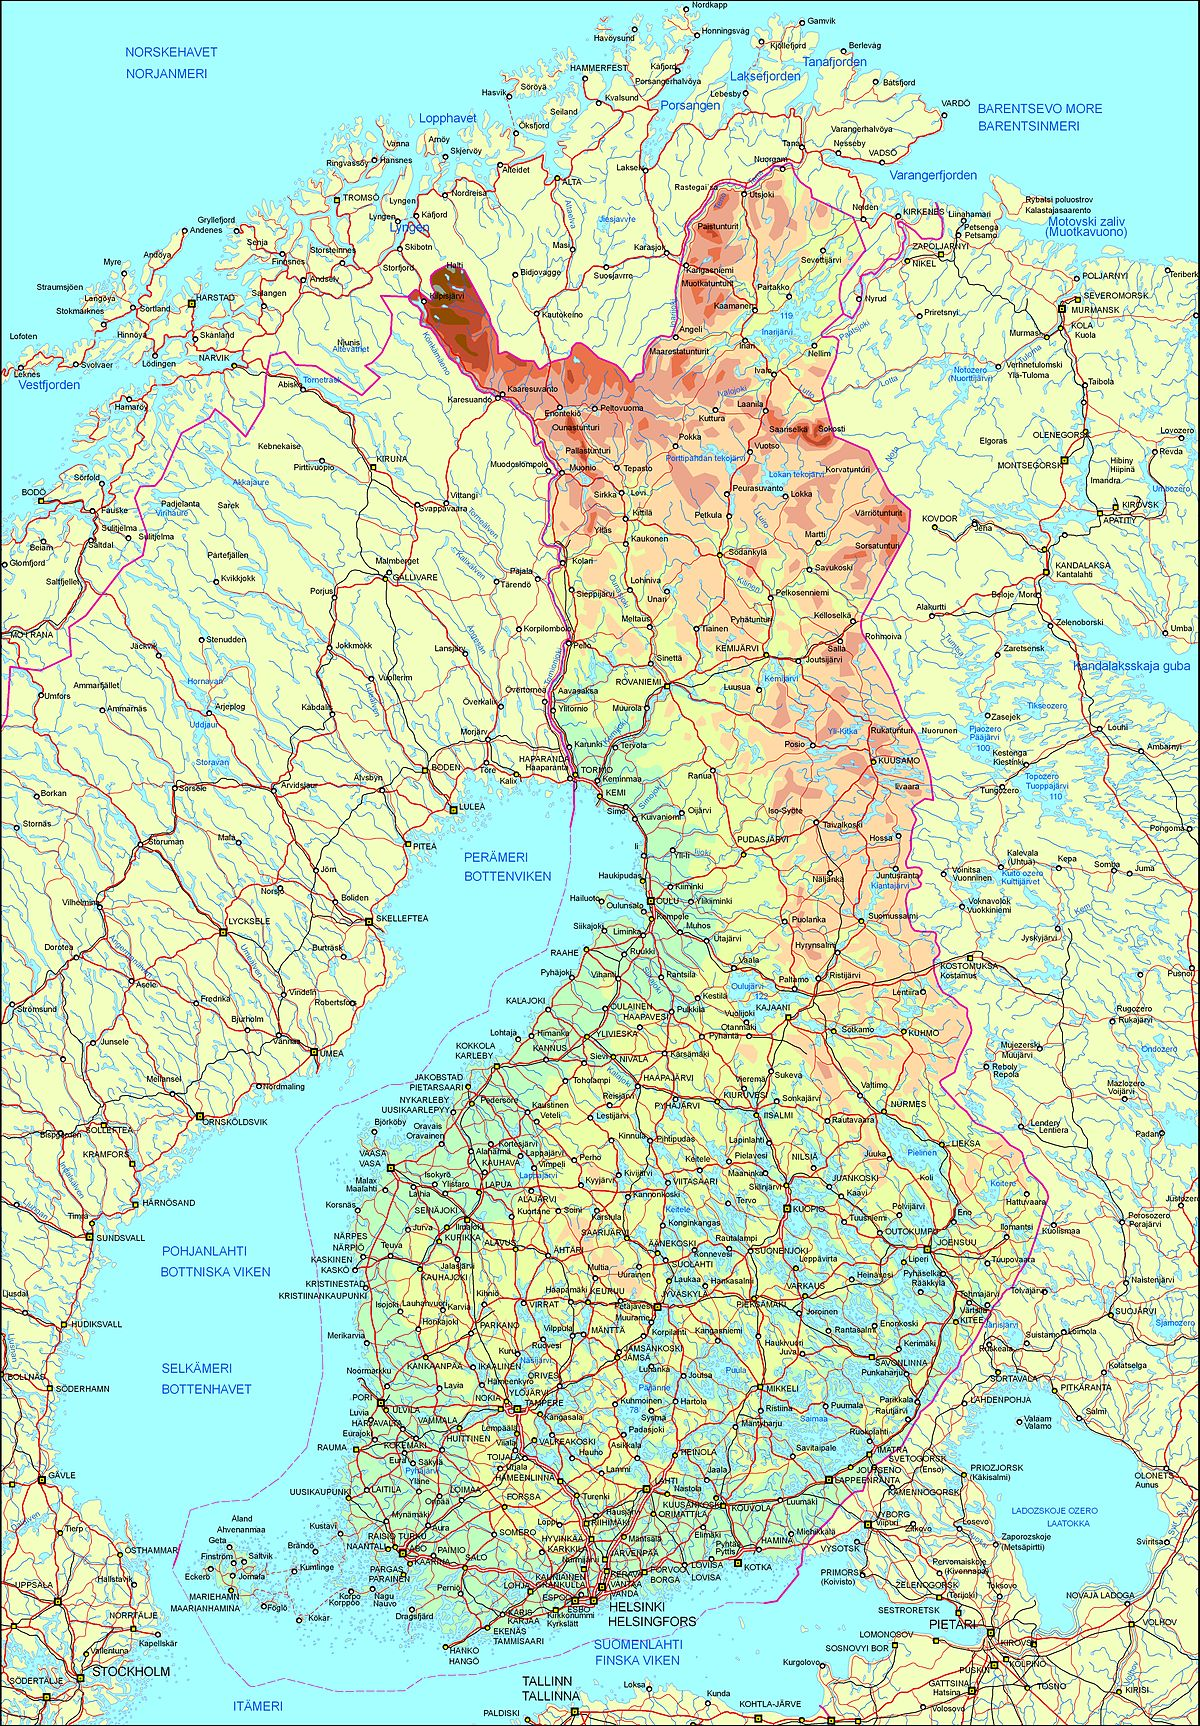 Suomen Kaupungit Kartat Paras Online Kasino Suomessa